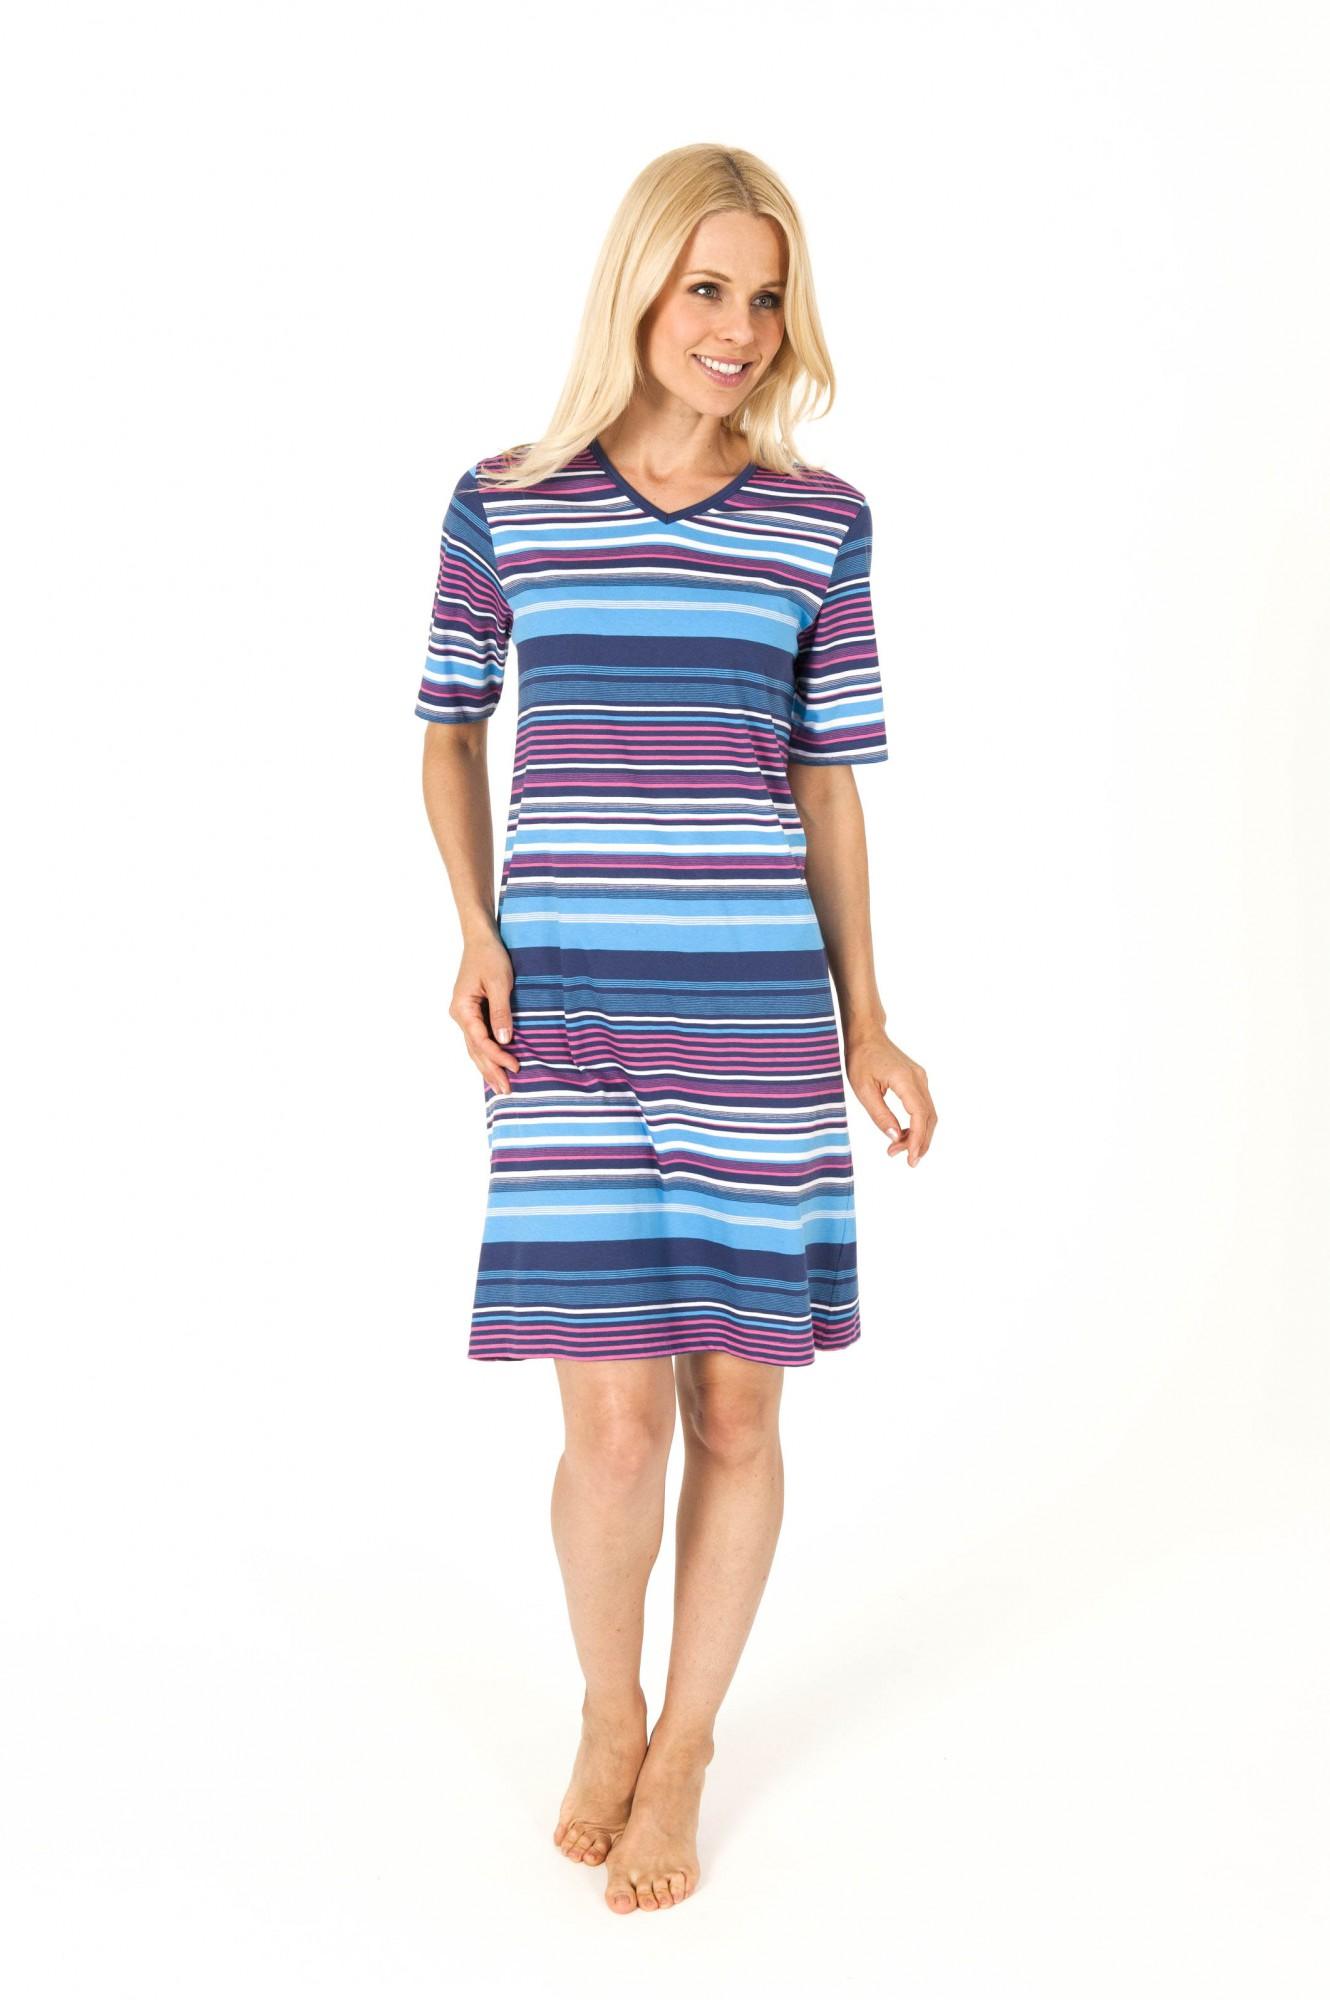 Schickes Damen Nachthemd kurzarm gestreift – 161 213 90 893 001